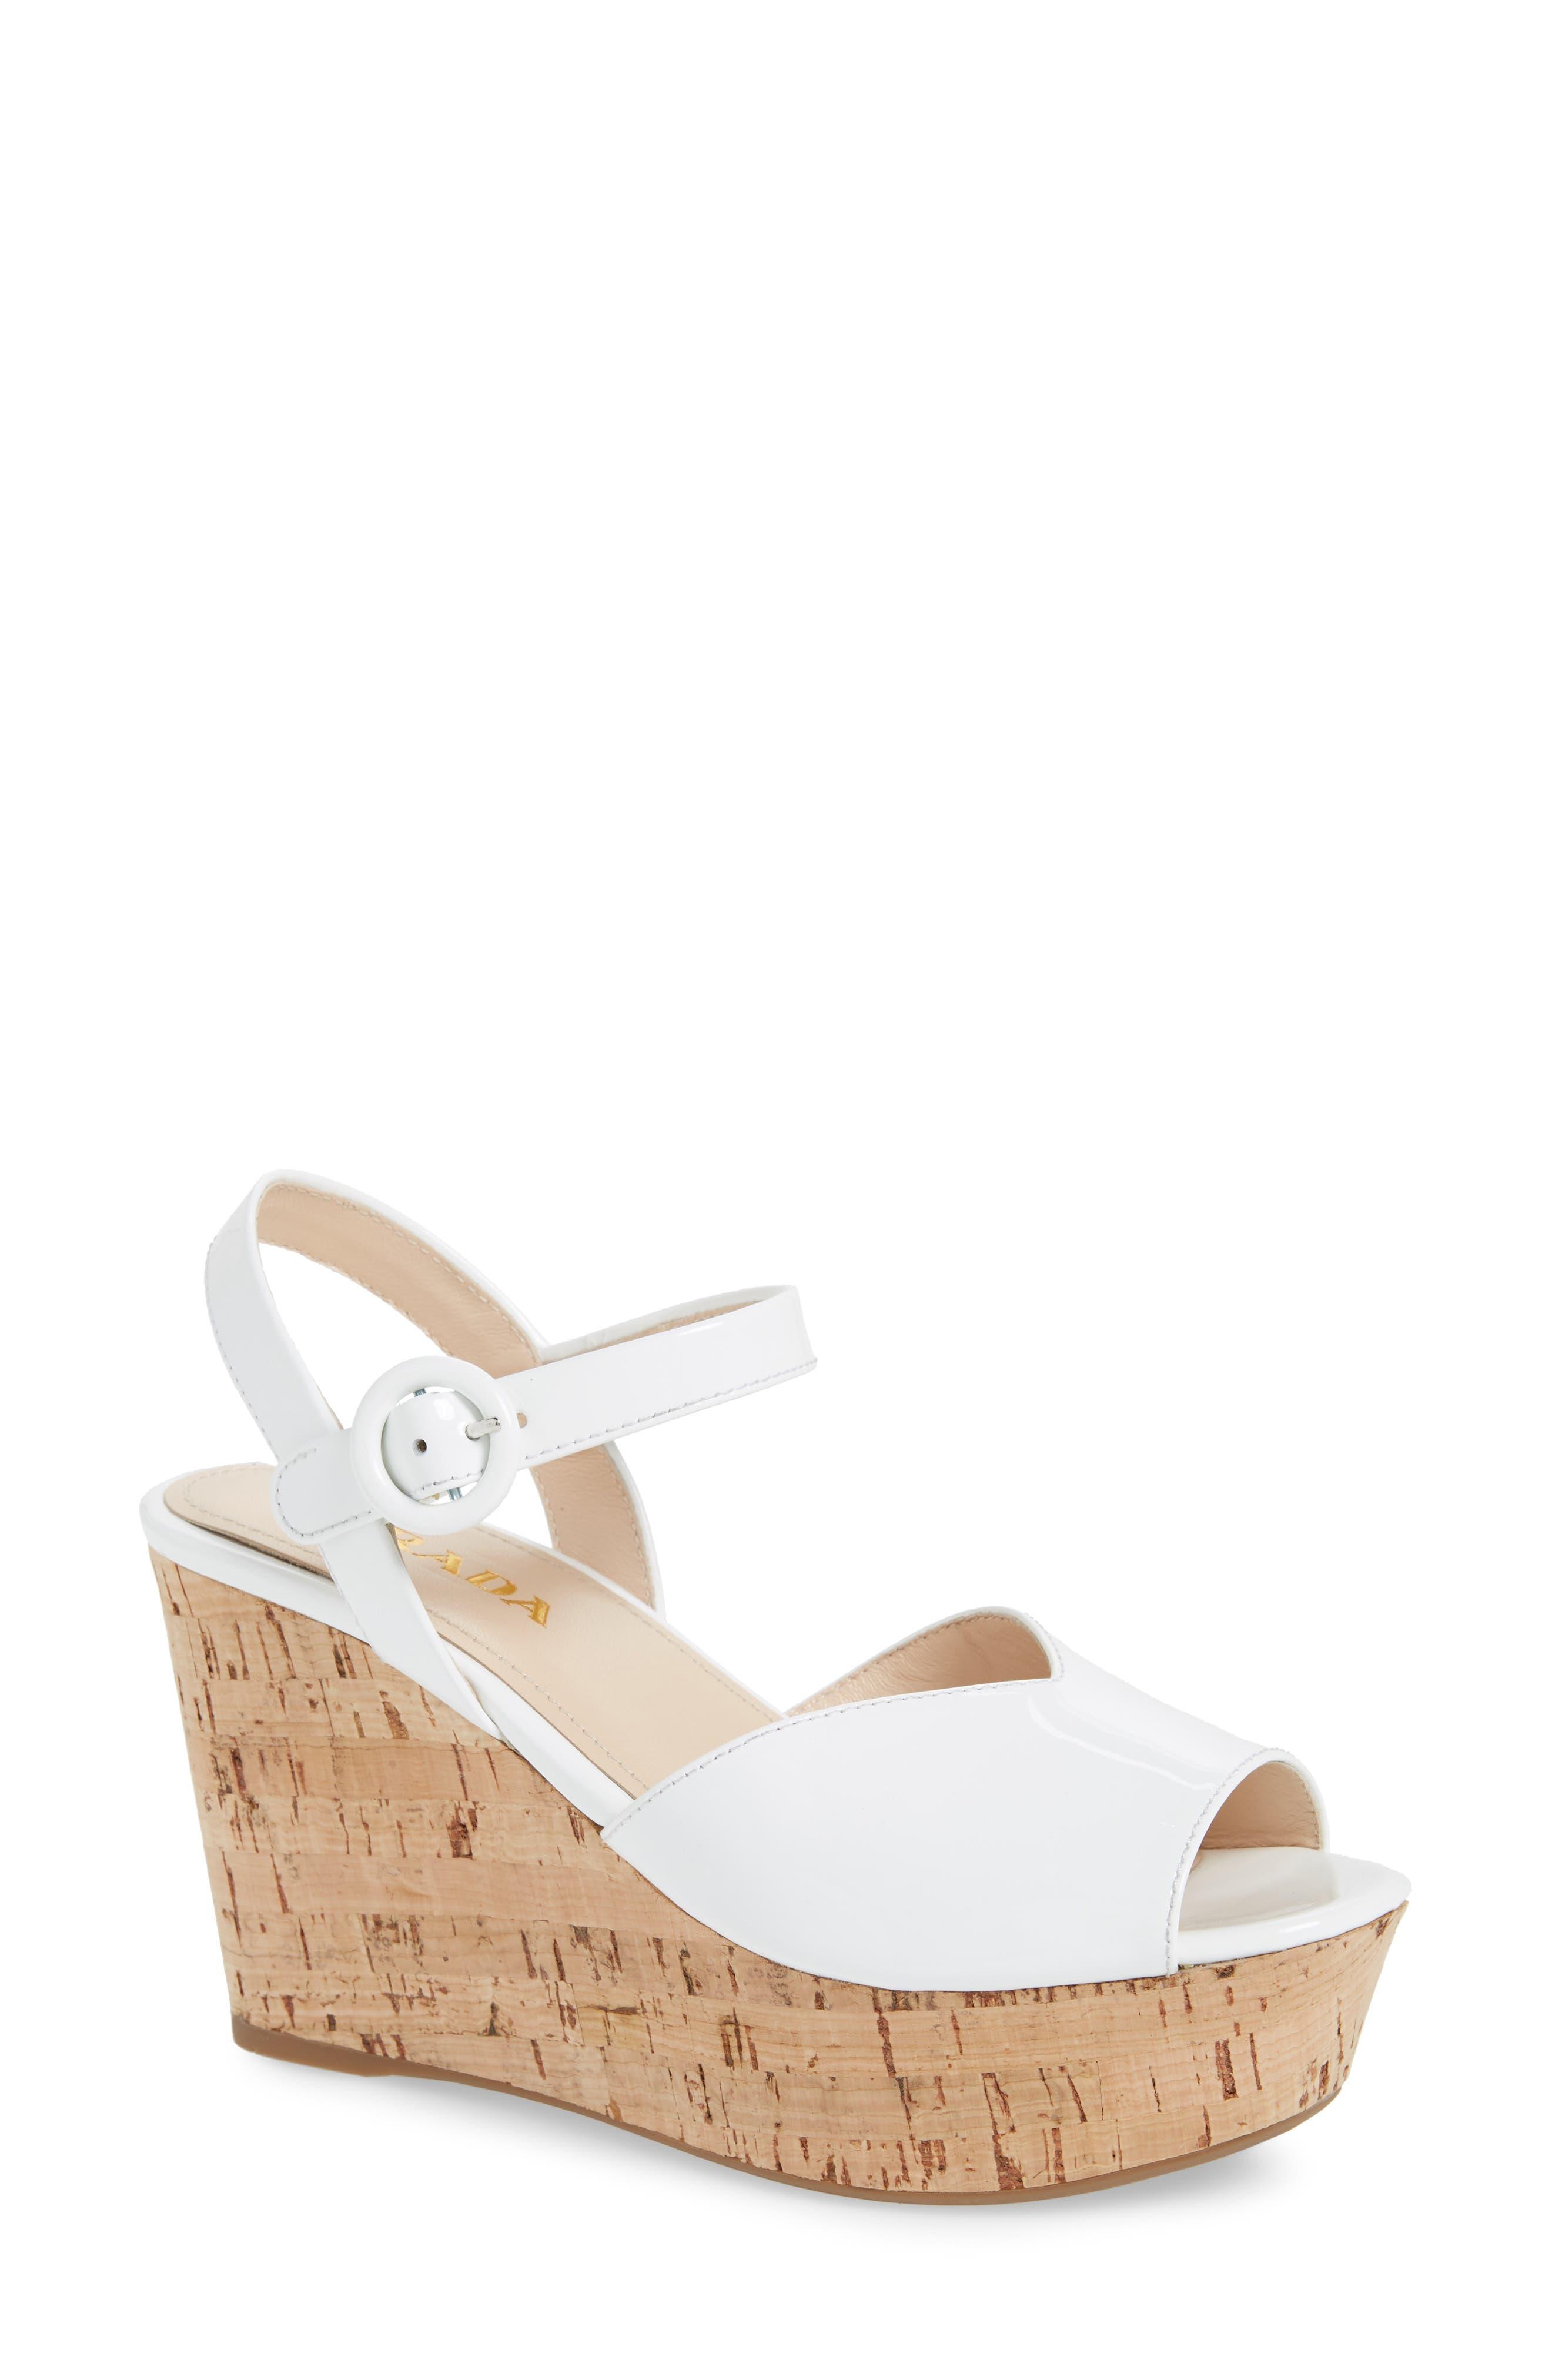 Wedge Platform Sandal,                         Main,                         color, WHITE PATENT